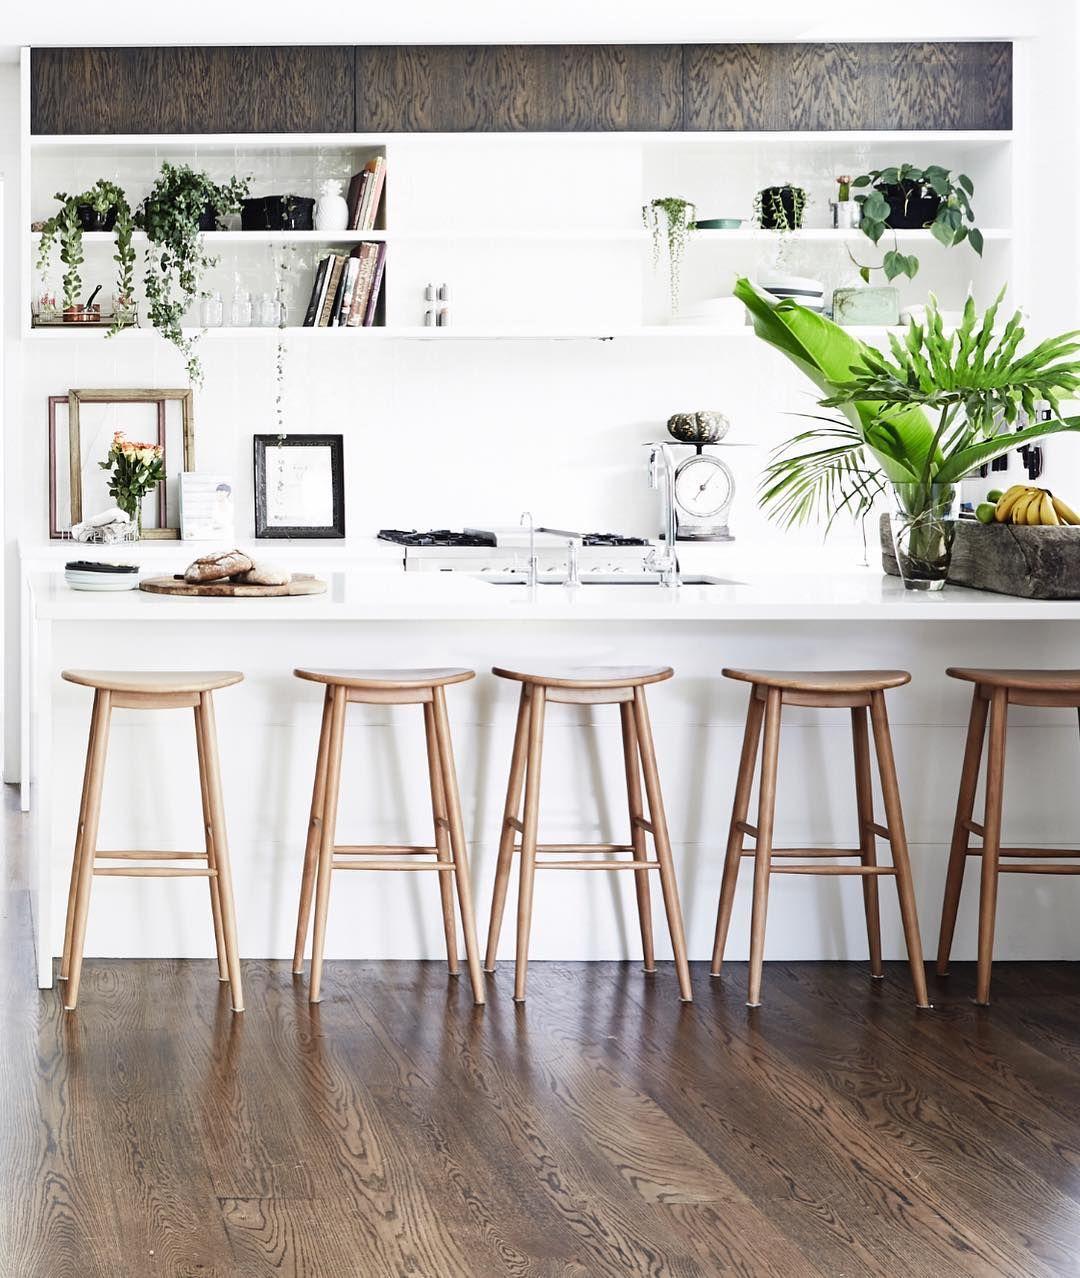 Magnolia Homes Interiors: Kitchen Style At Magnolia House #byronbeachabodes